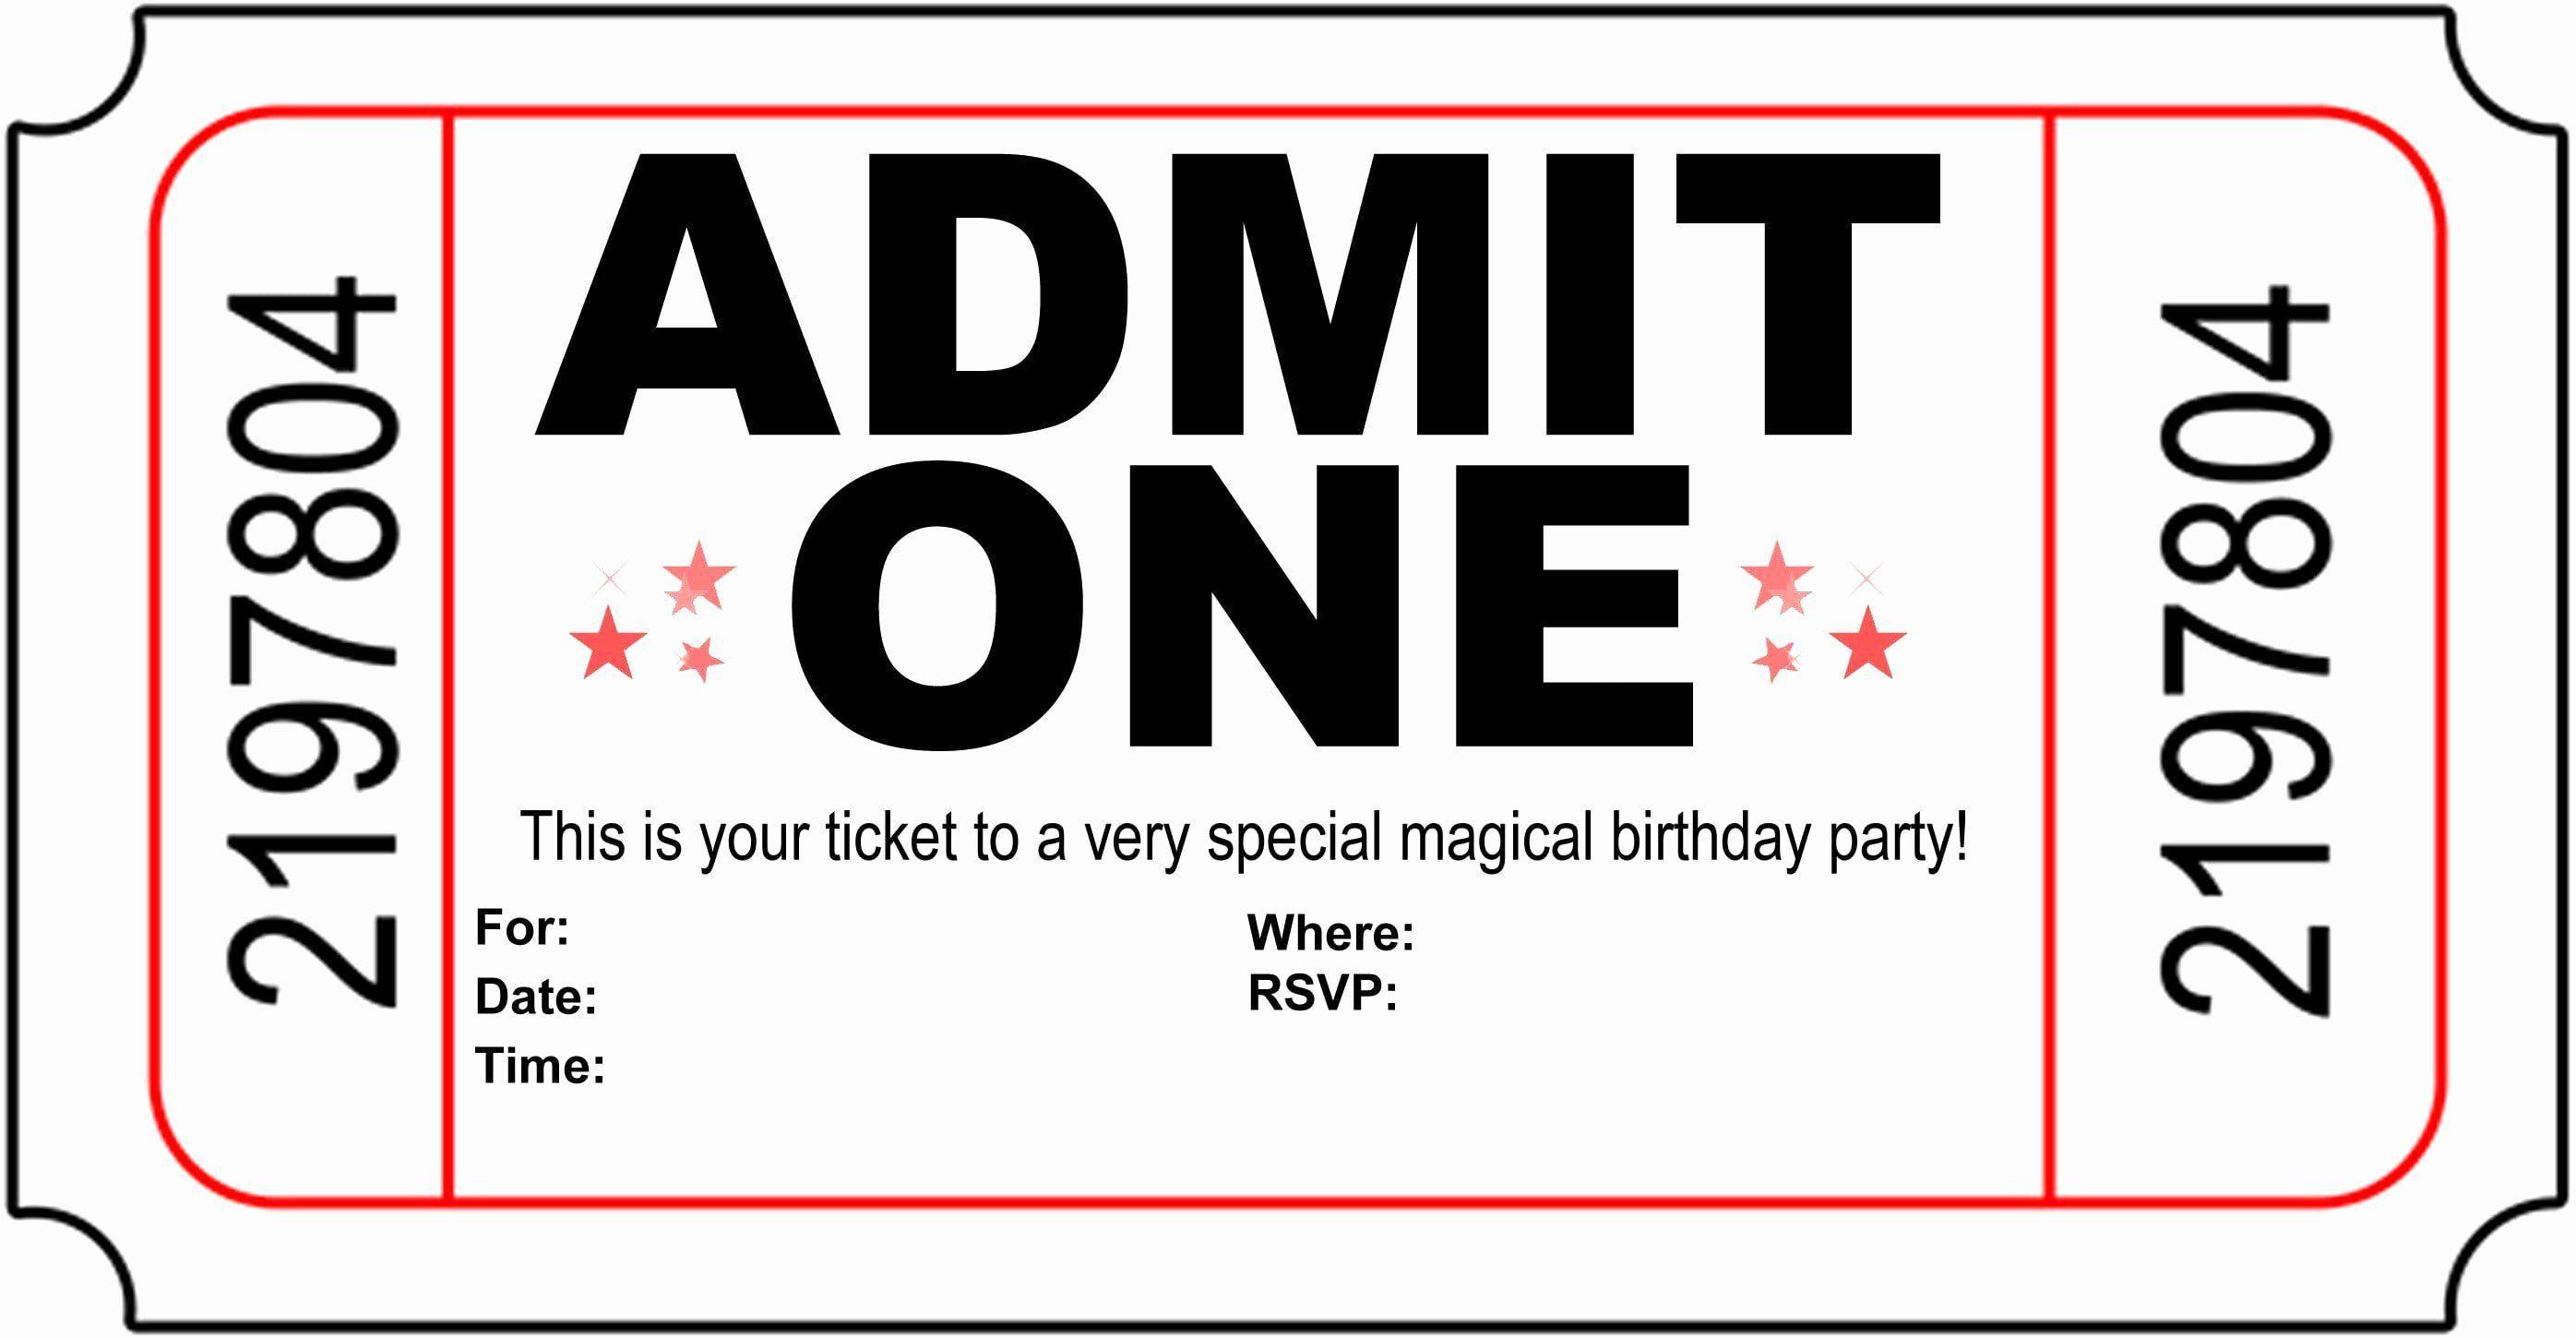 Ticket Invitation Template Free Elegant Free Printable Birthday Invitati In 2020 Free Party Invitations Birthday Party Invitations Free Free Party Invitation Templates